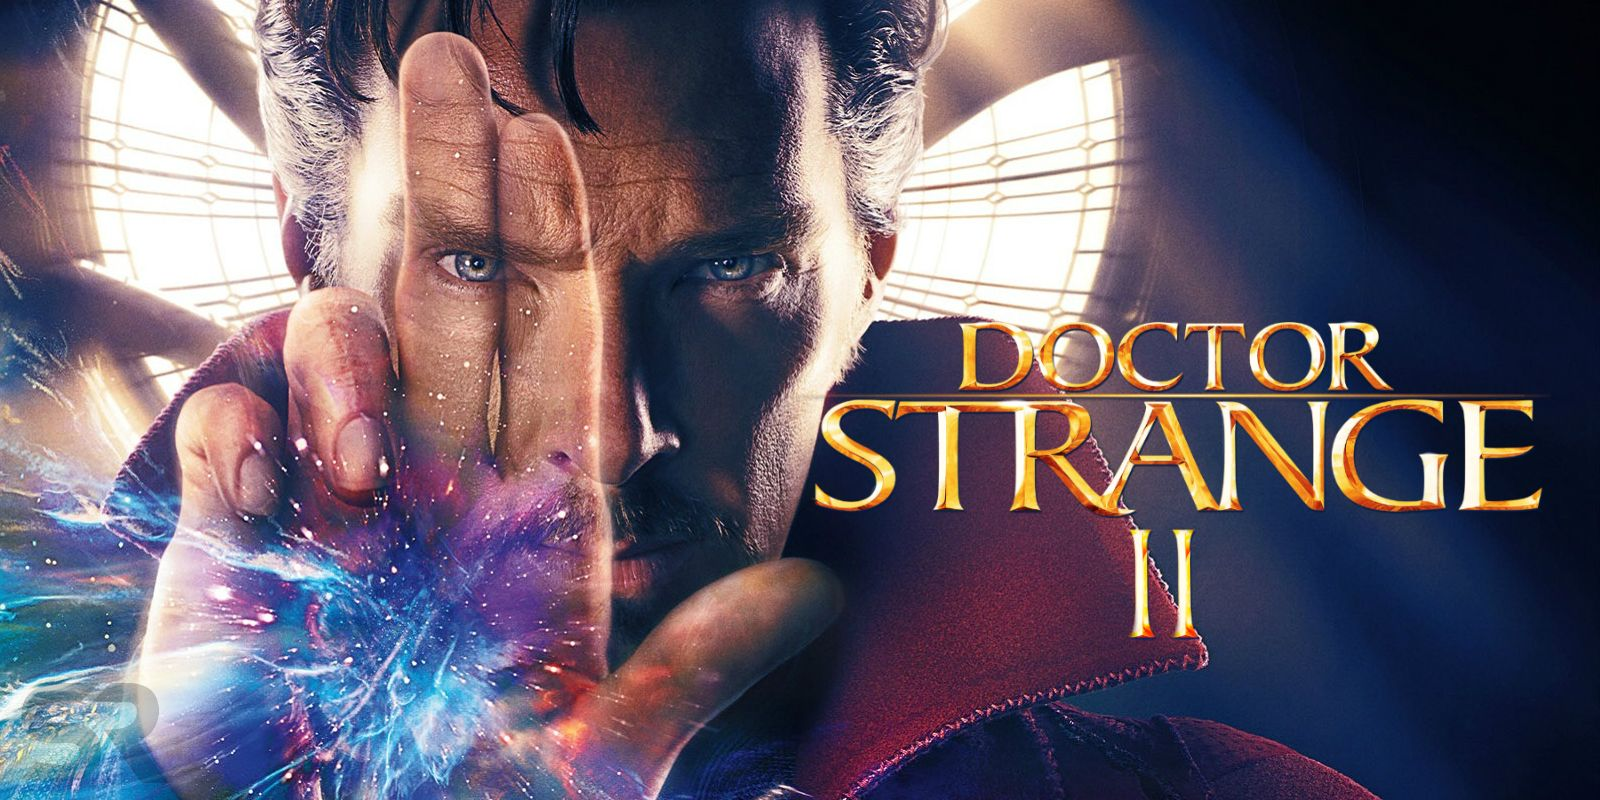 Doctor Strange Sequel Moving Forward, Scott Derrickson to Direct